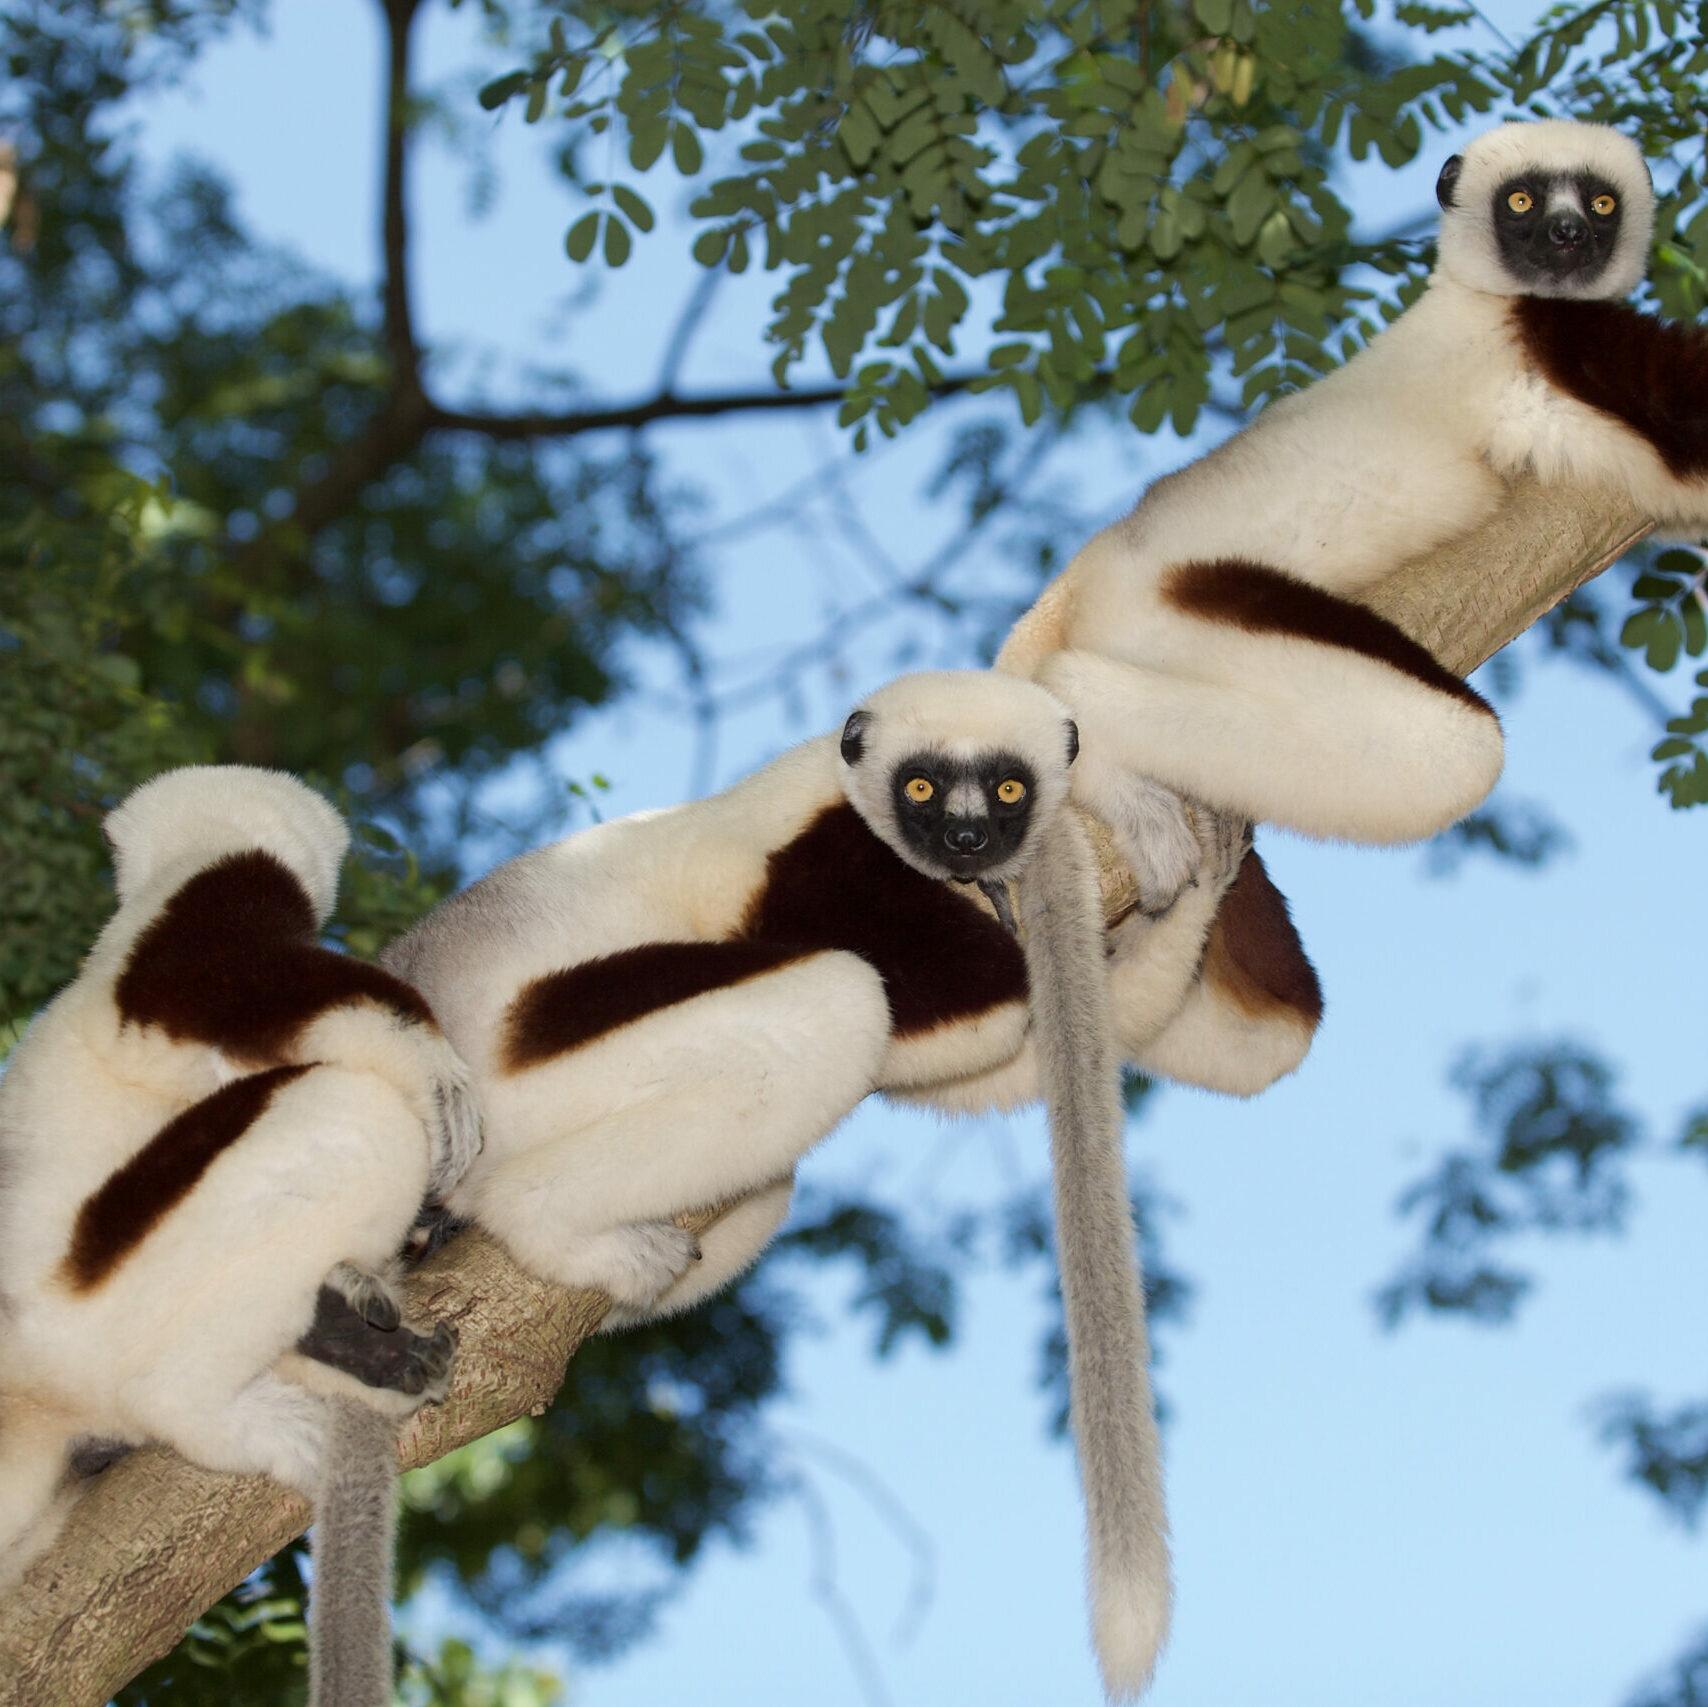 Three sifaka lemurs on a branch